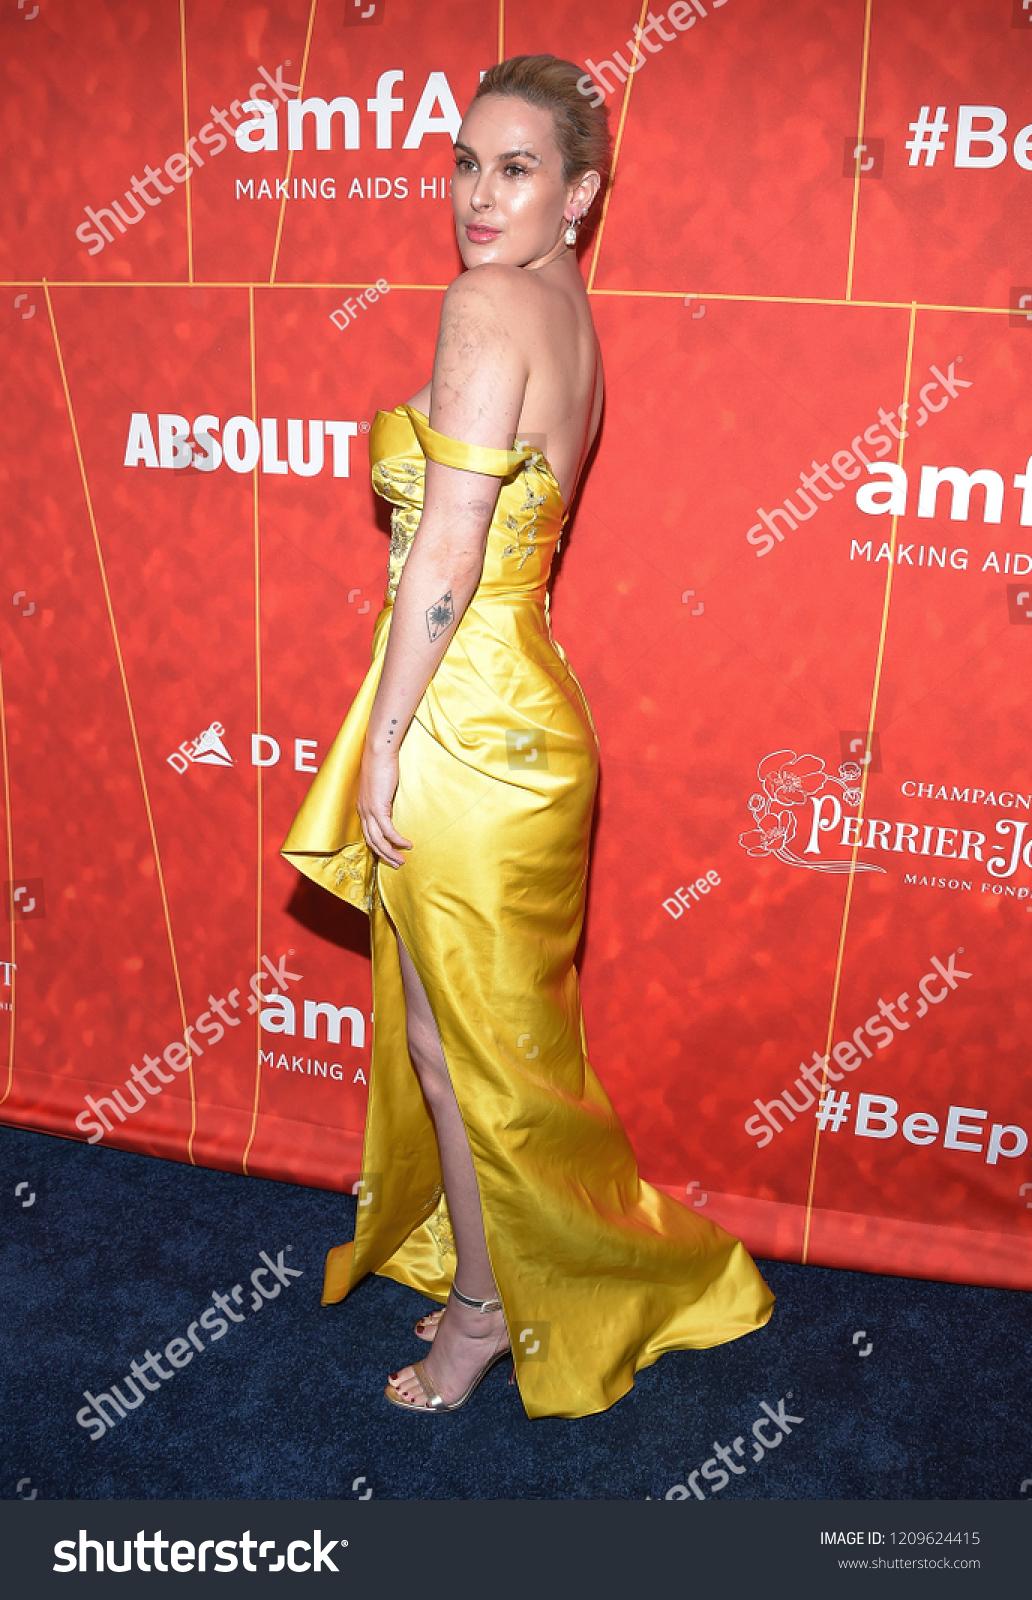 Selfie Rebecca Romijn nude (71 photos), Ass, Paparazzi, Selfie, lingerie 2018